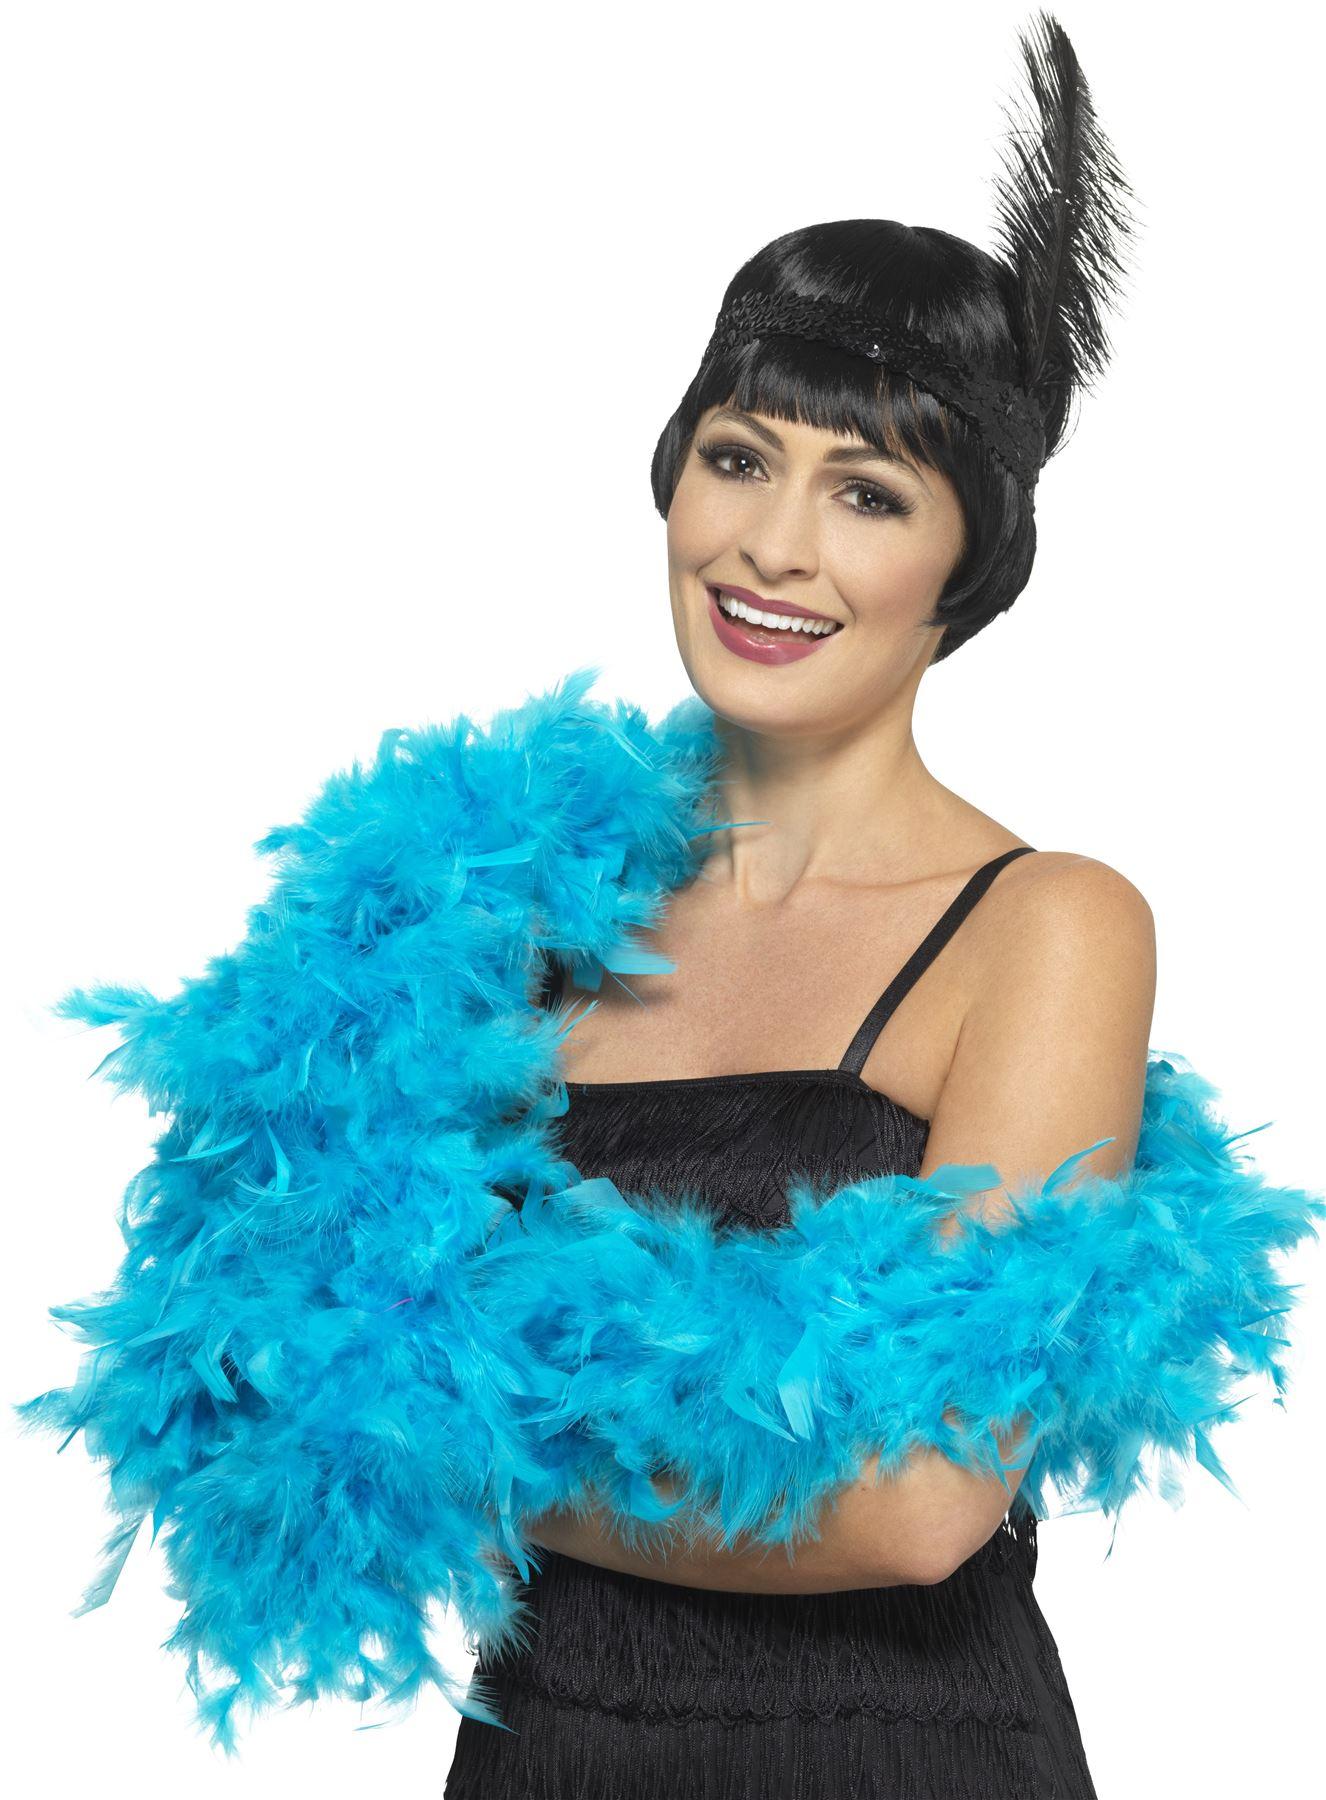 Pluma-Boa-Hen-Noche-Deluxe-Gatsby-Flapper-Burlesque-1920s-Accesorio-6-ft-approx-1-83-m